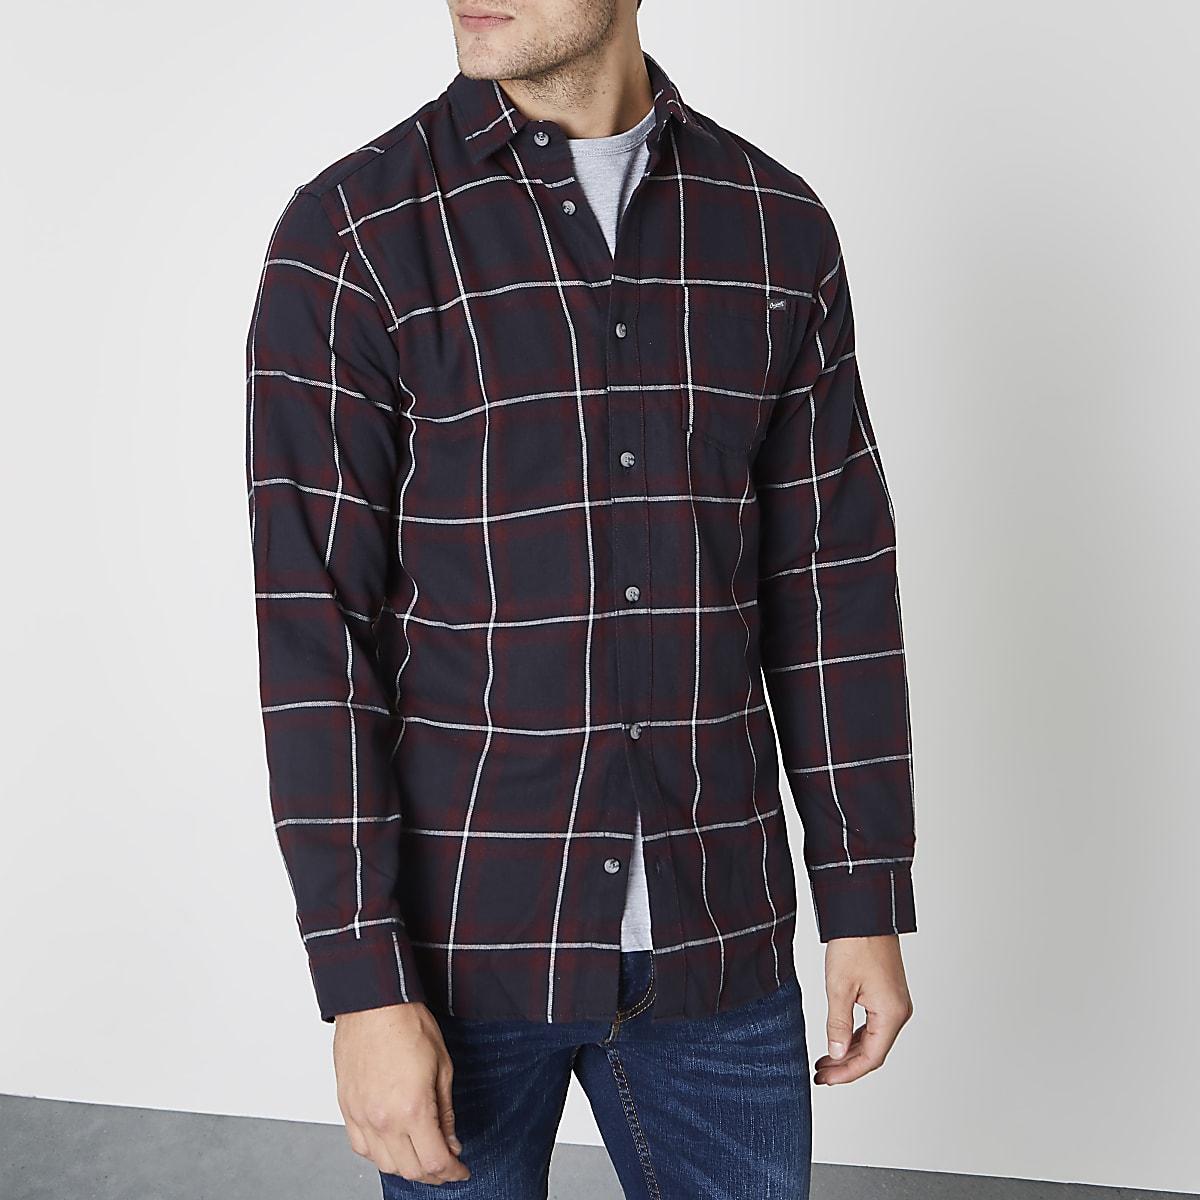 Jack & Jones dark red check long sleeve shirt